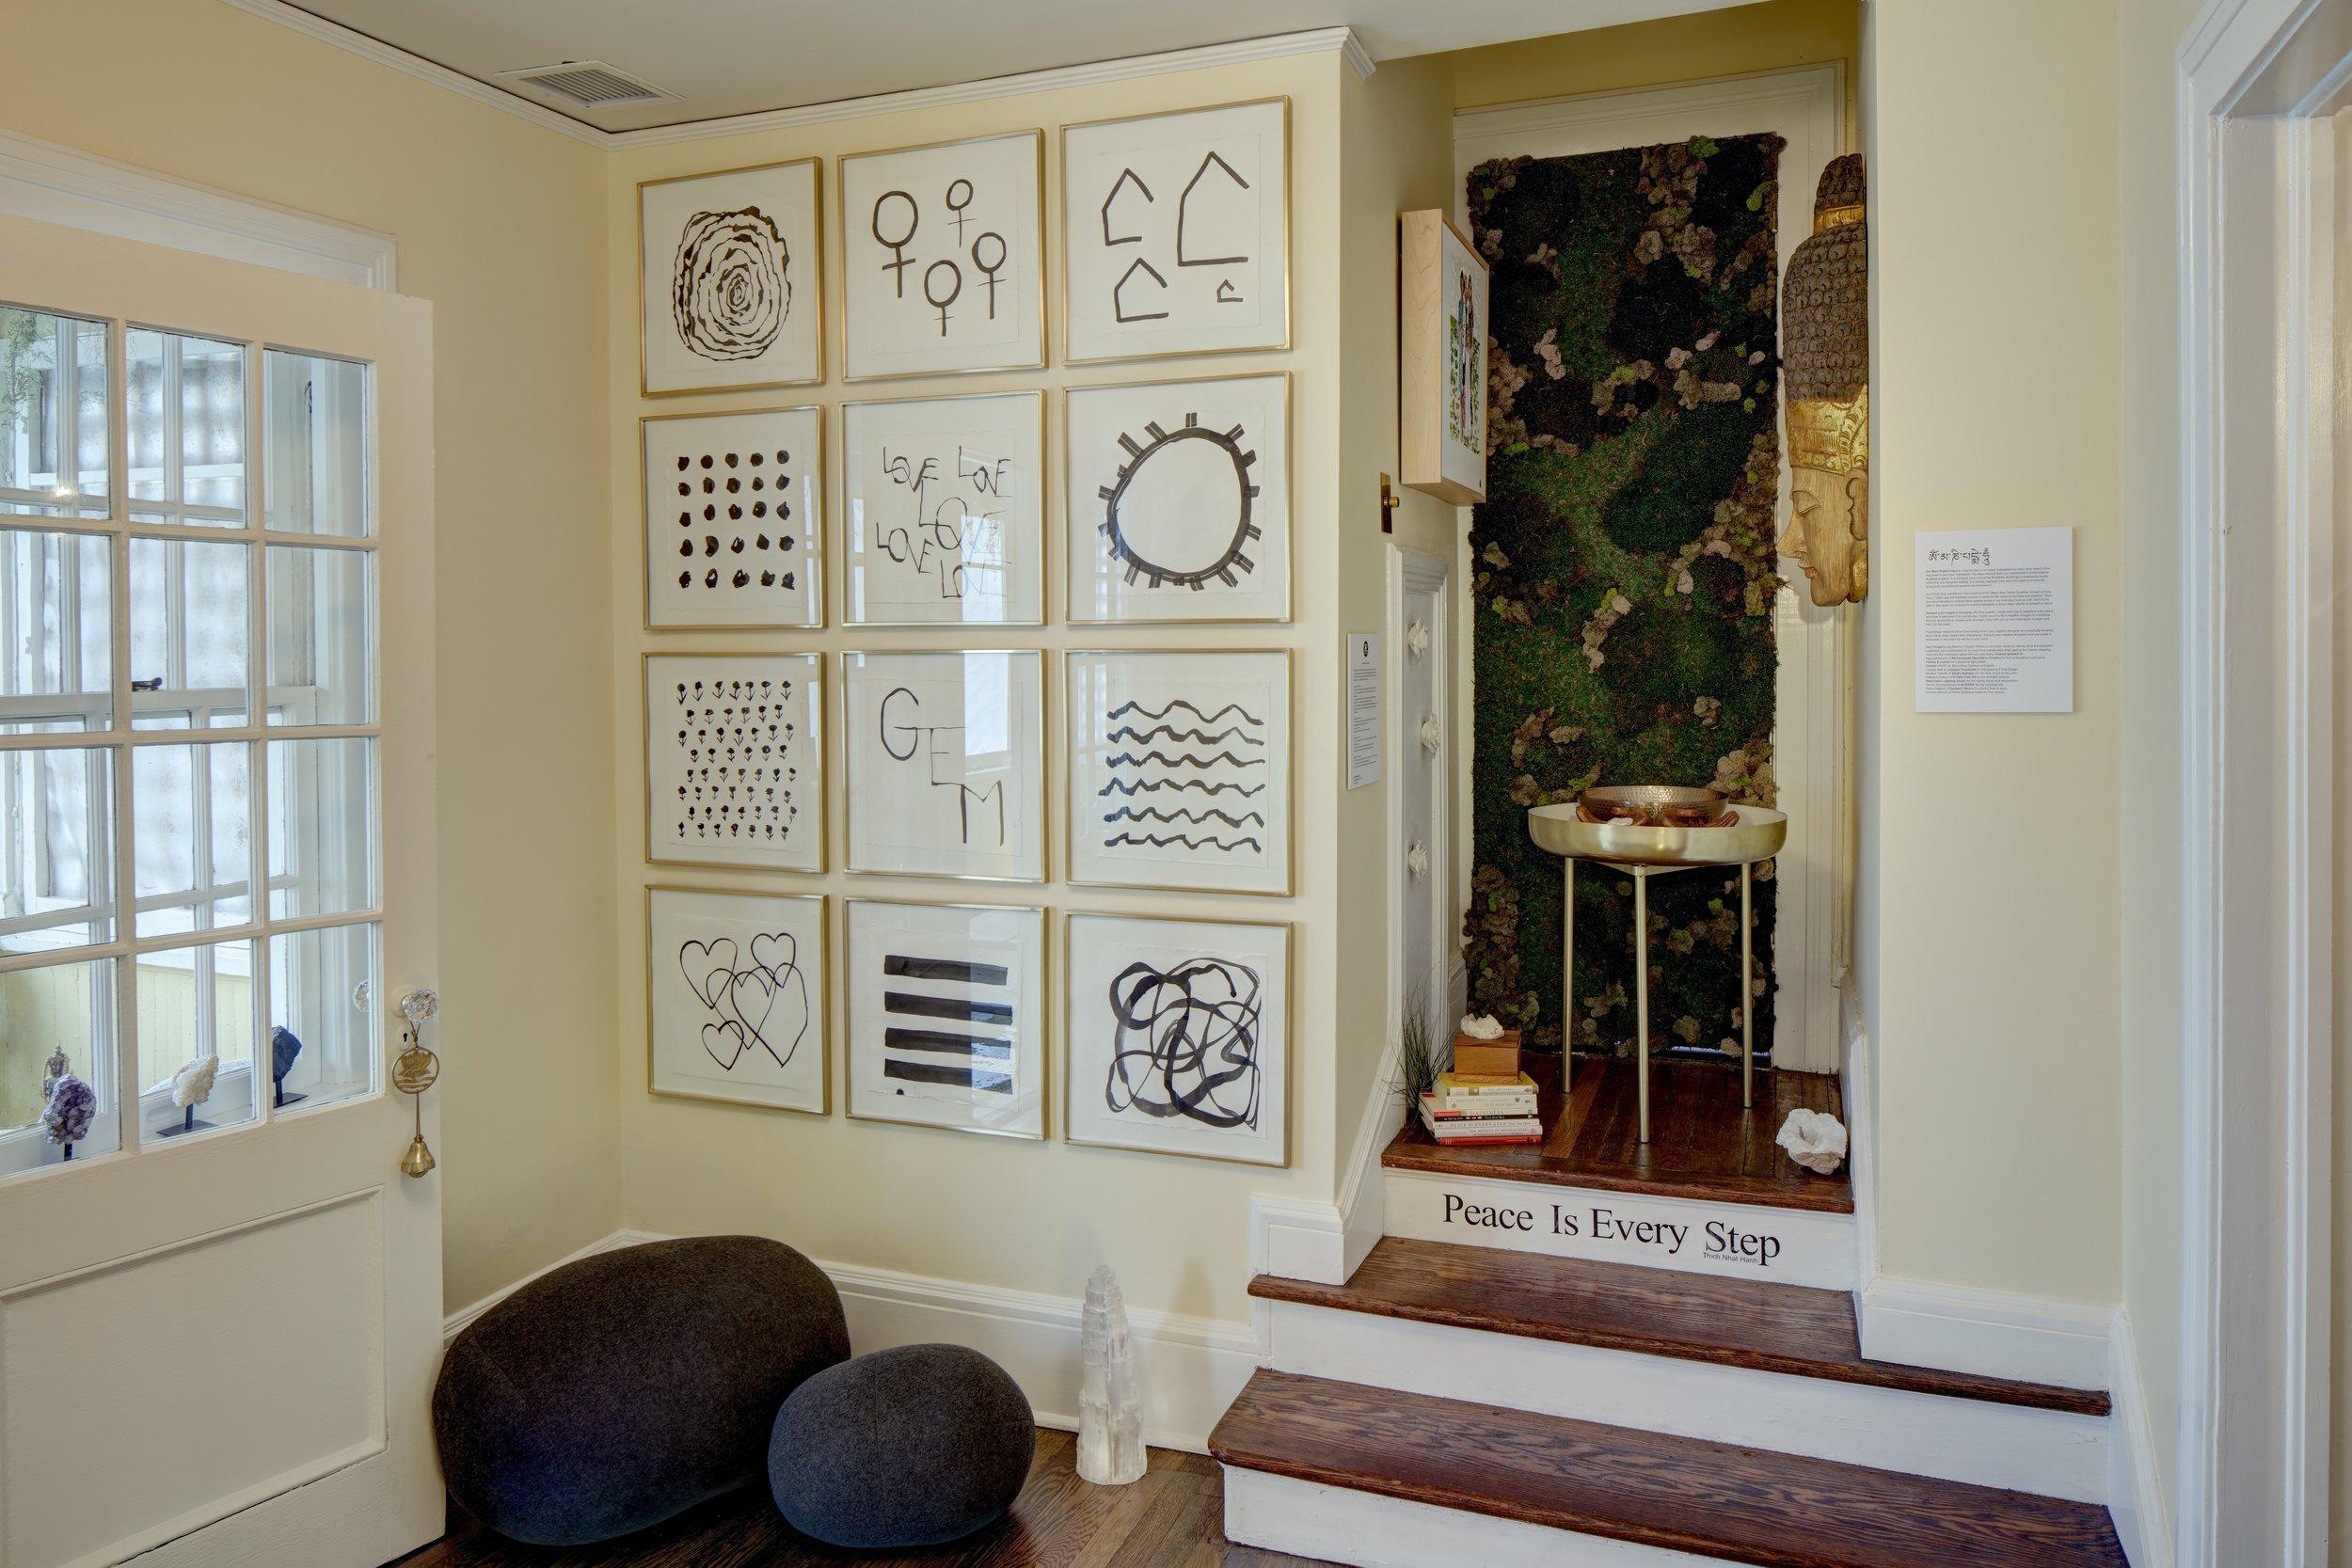 Marina V Design Studio Showhouse meditation space img3.jpg